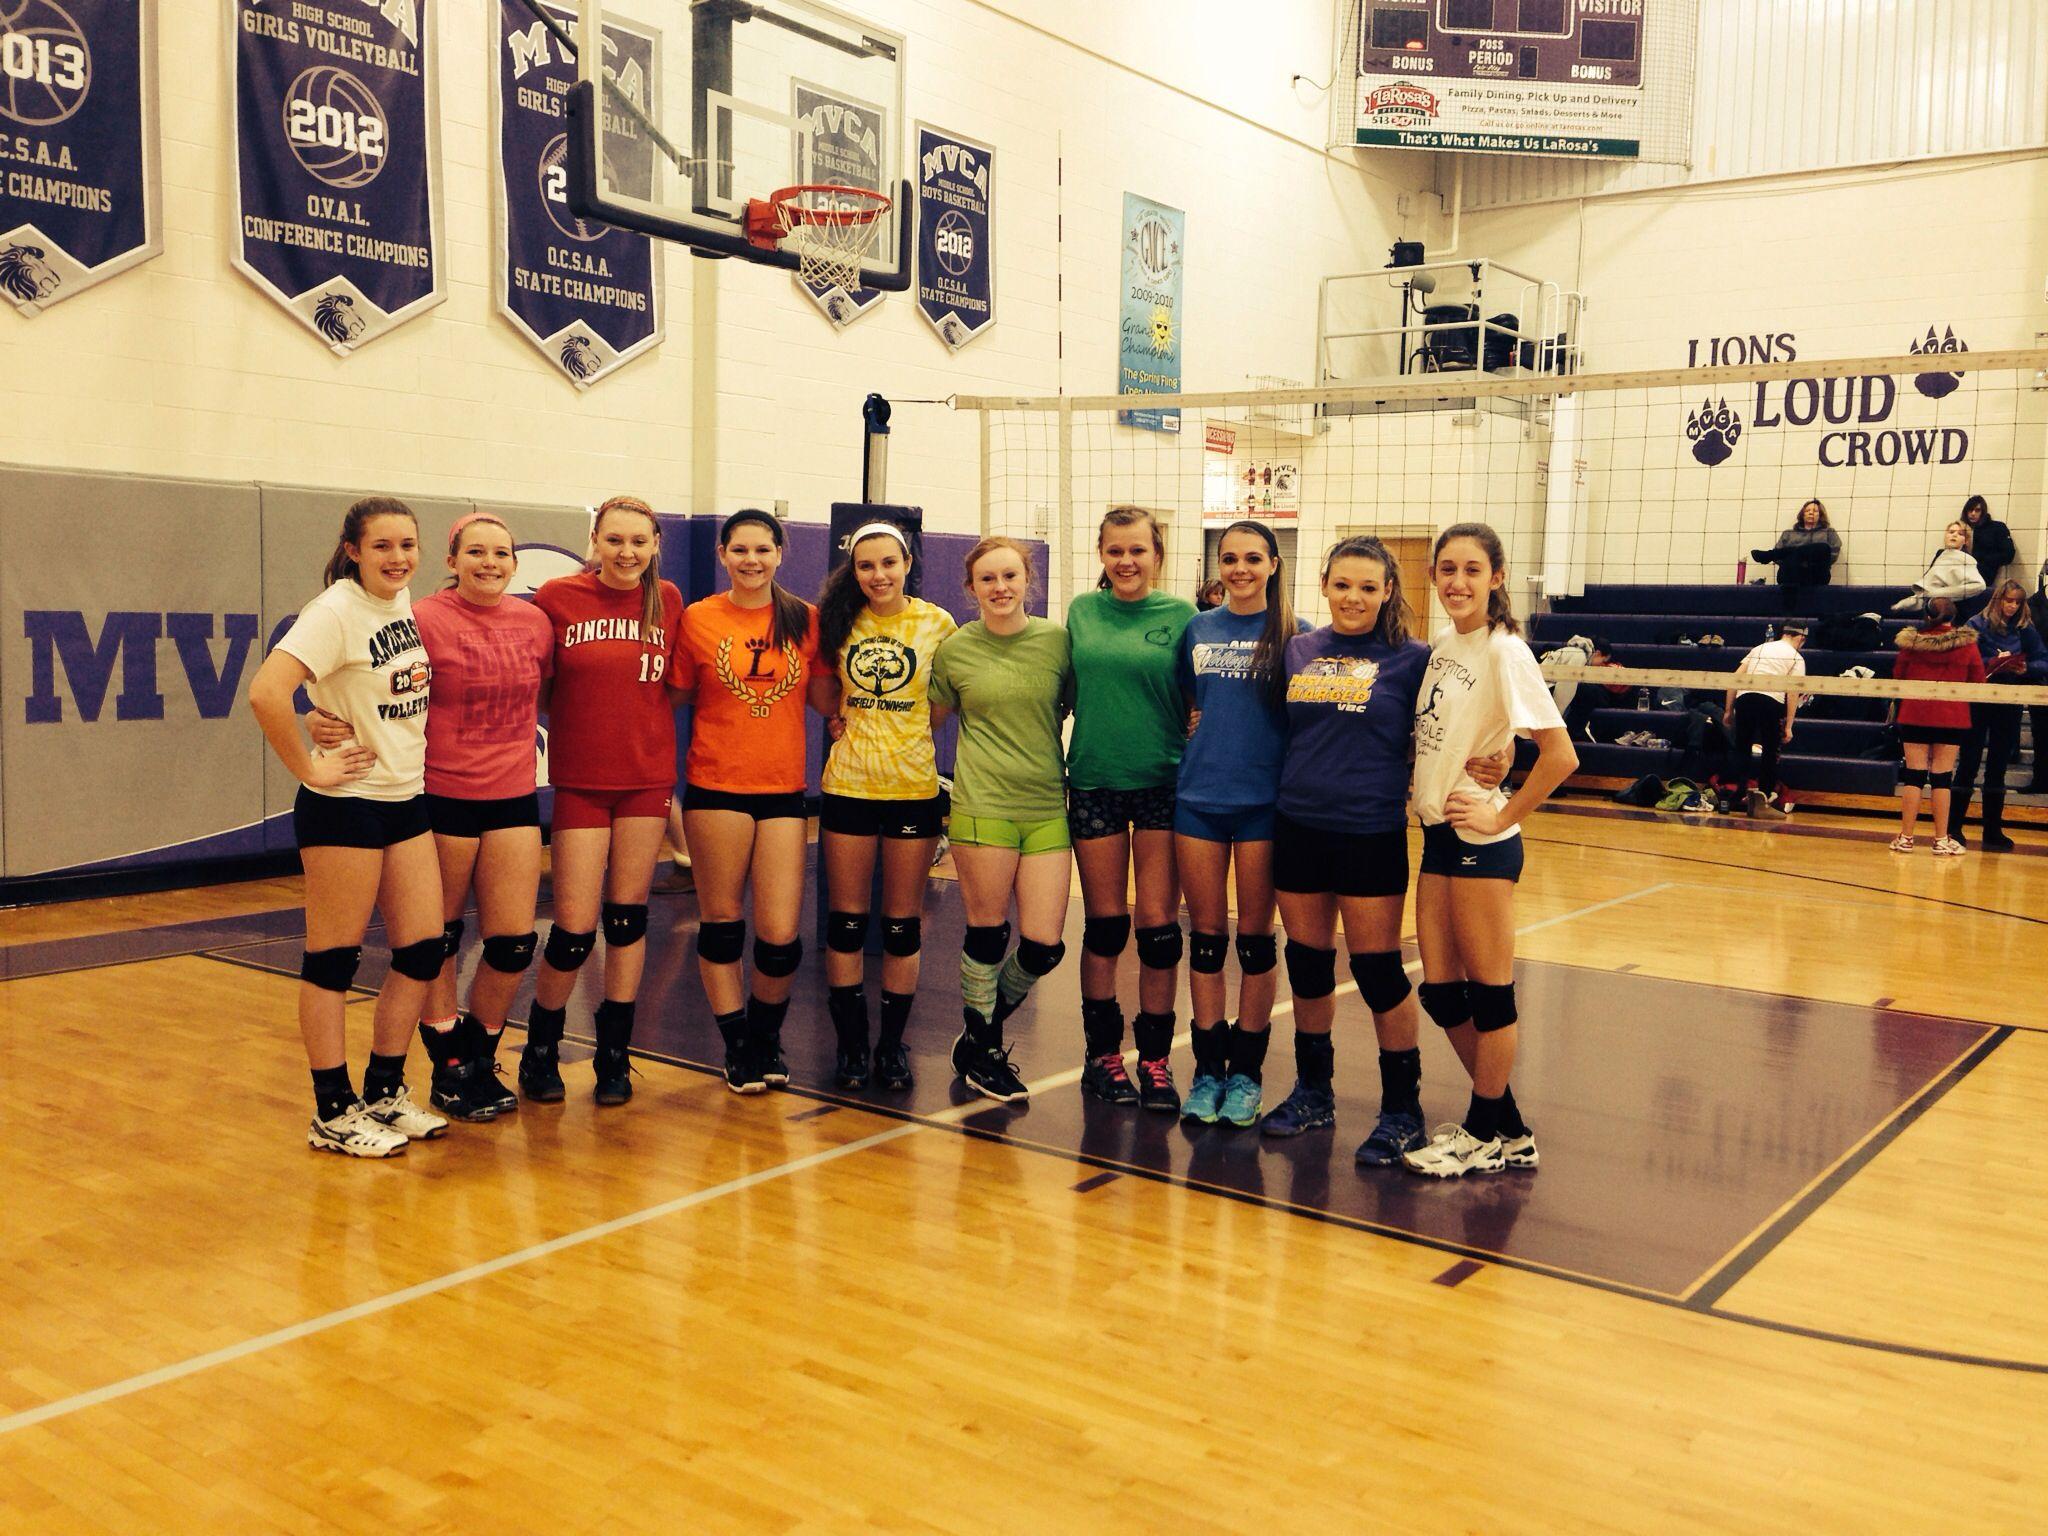 Volleyball Team Volleyball Club Team Rainbow Volleyball Team Volleyball Teams